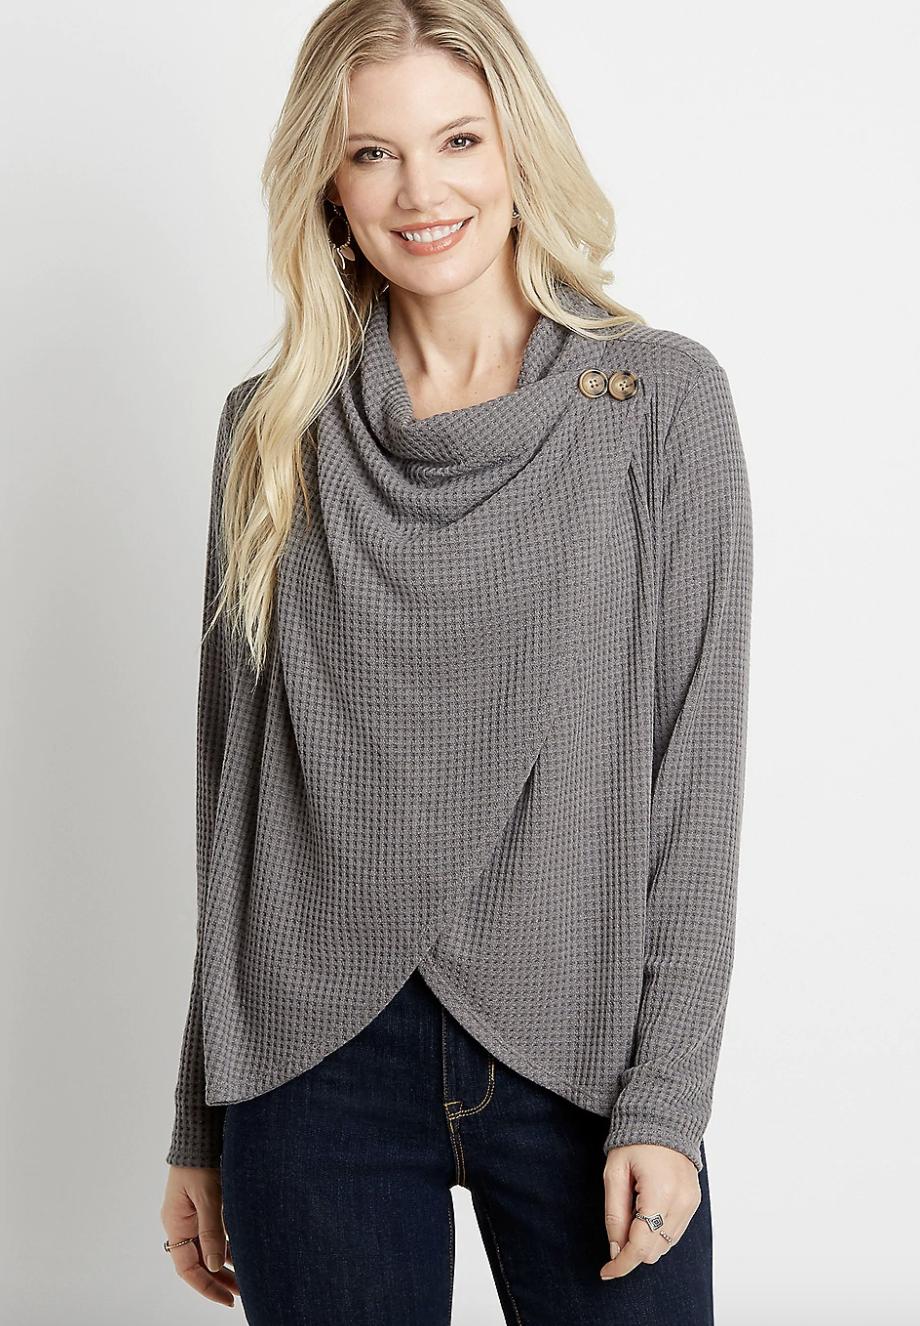 a model in the grey cardigan